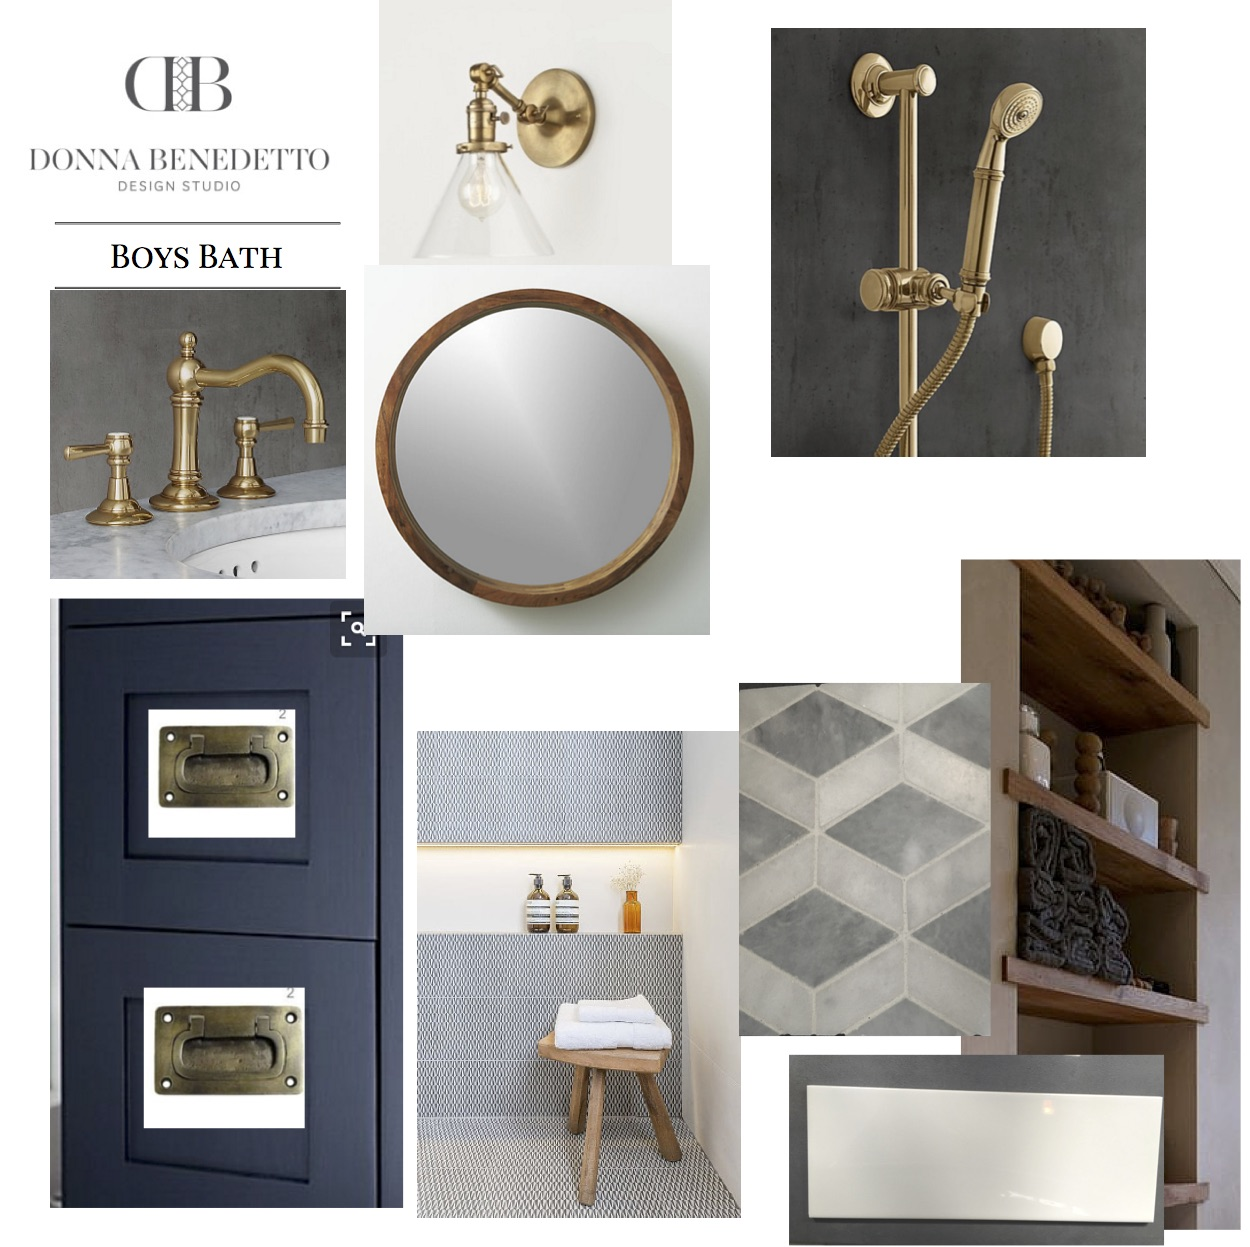 Boys Bathroom Blog Donna Benedetto Designs